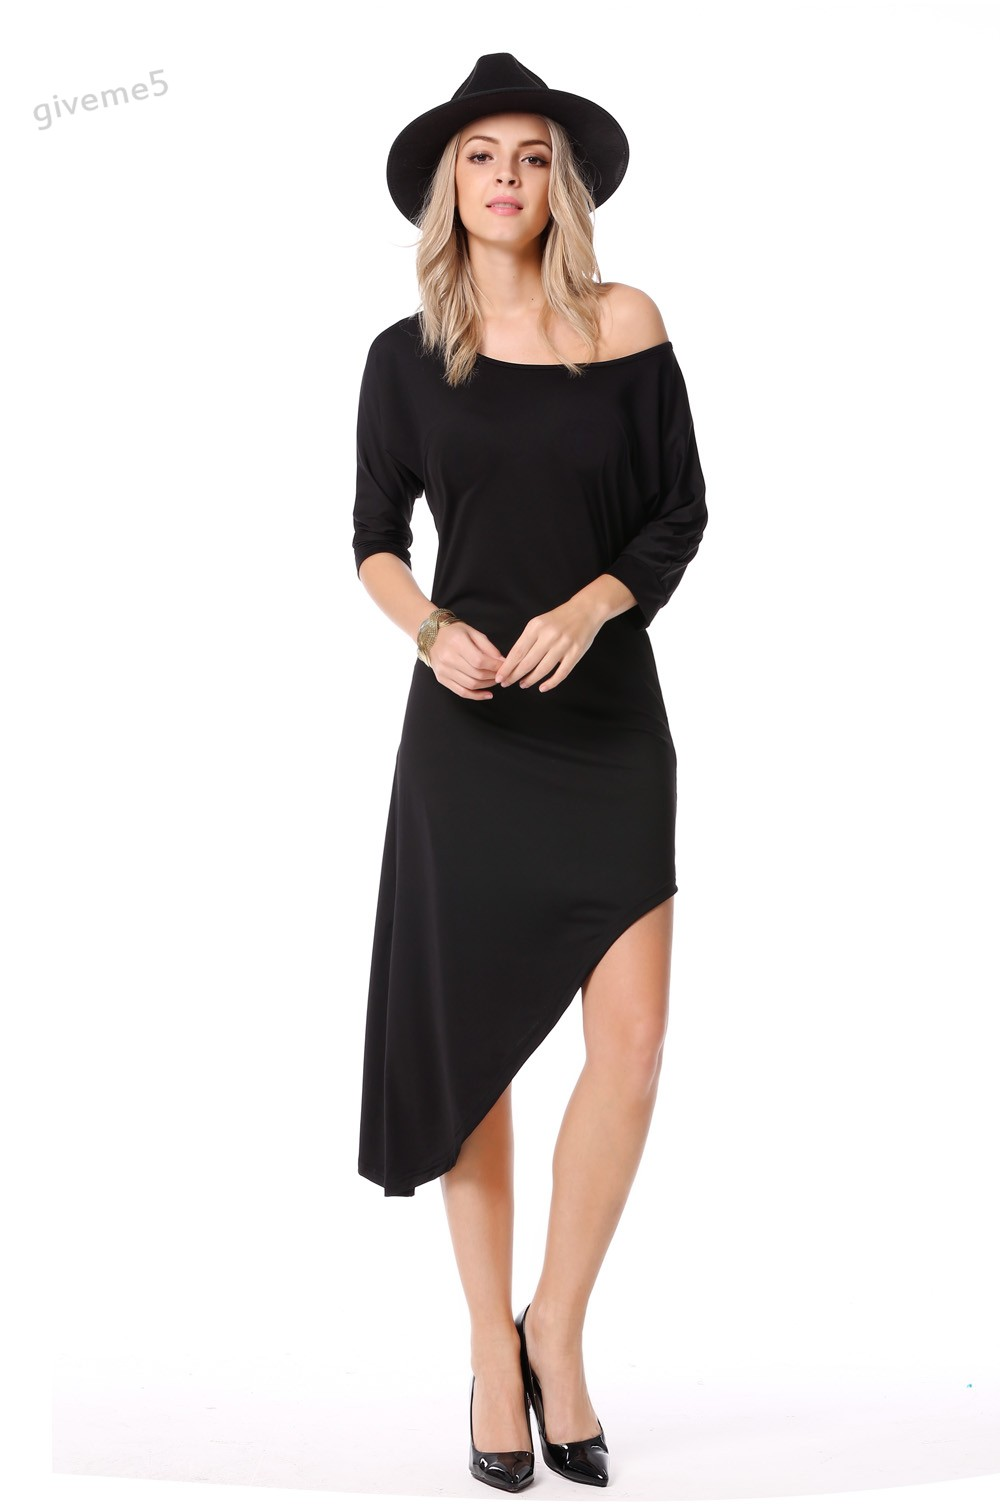 2017 New  Women Fashion Sexy Round Neck Medium Batwing Sleeve Stretch Solid Irregular Dress Free Shipping 51